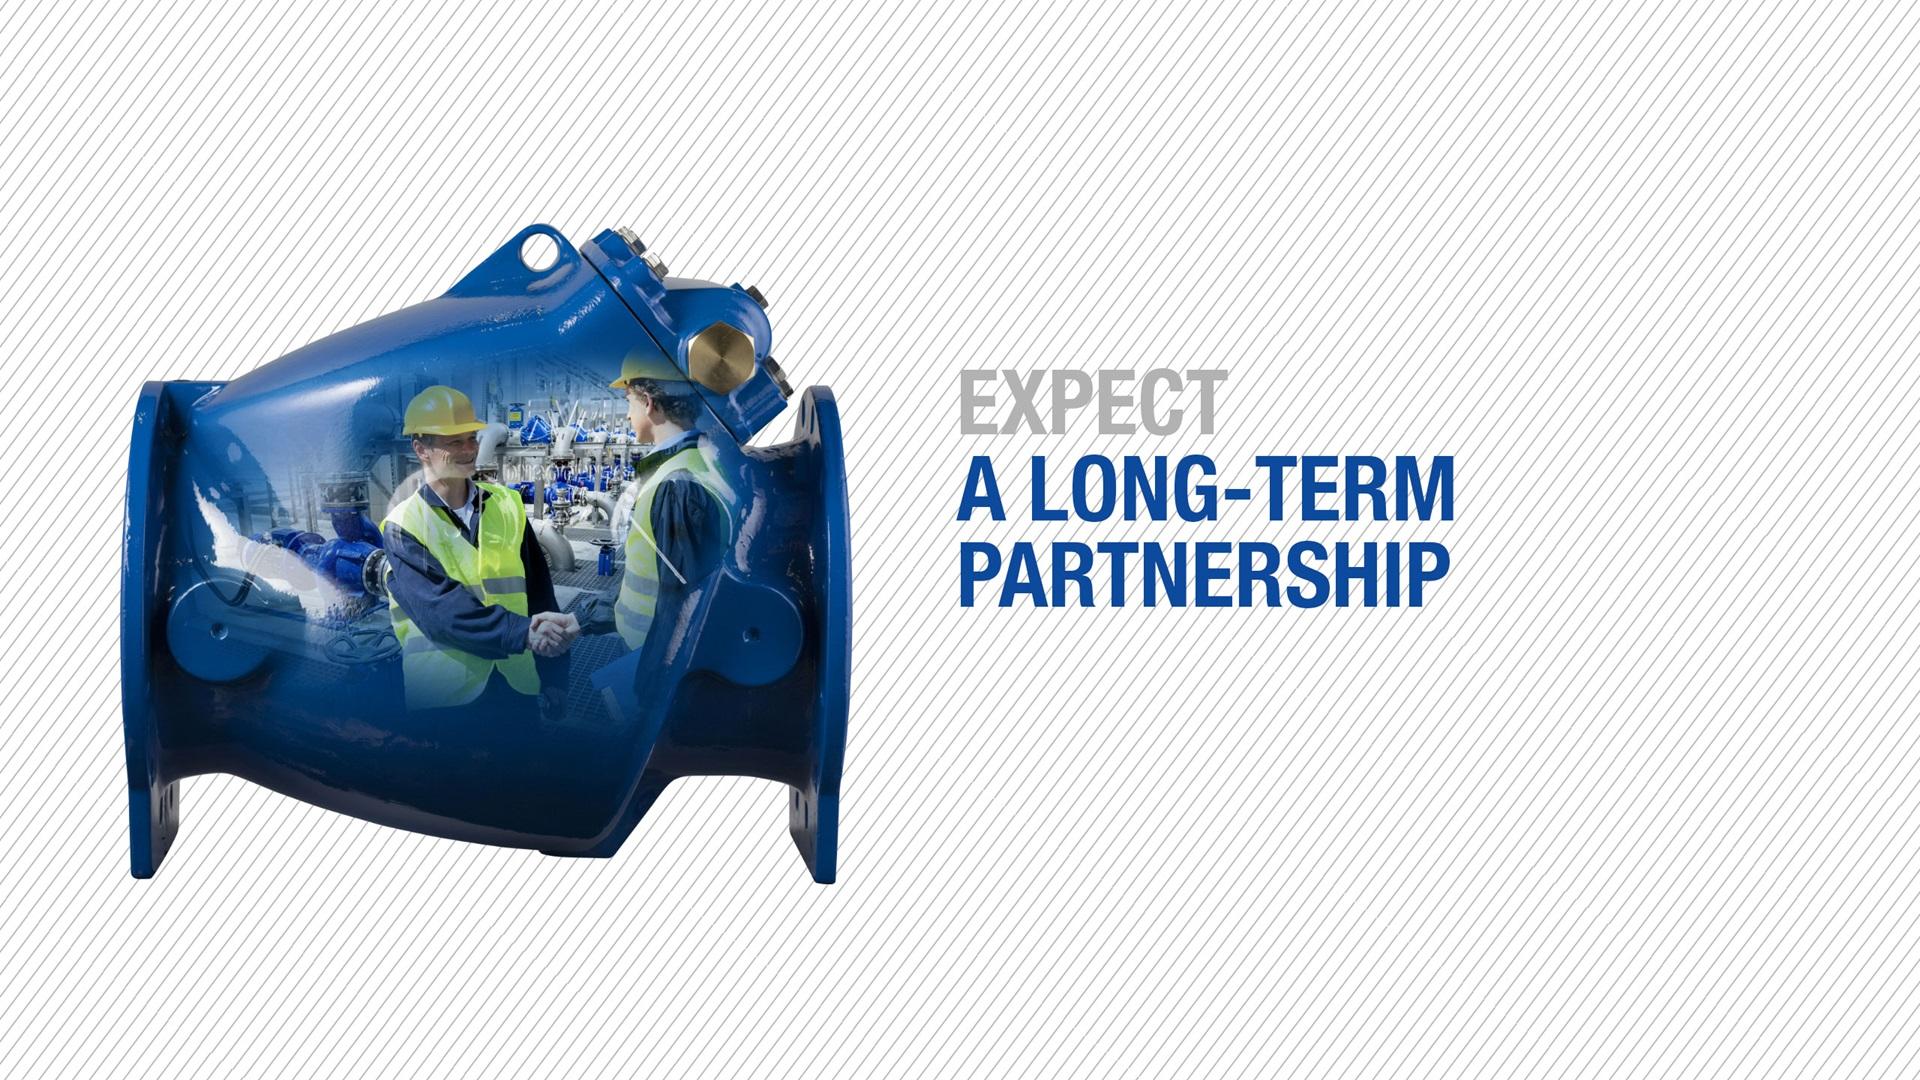 Expect long-term partnership from AVK